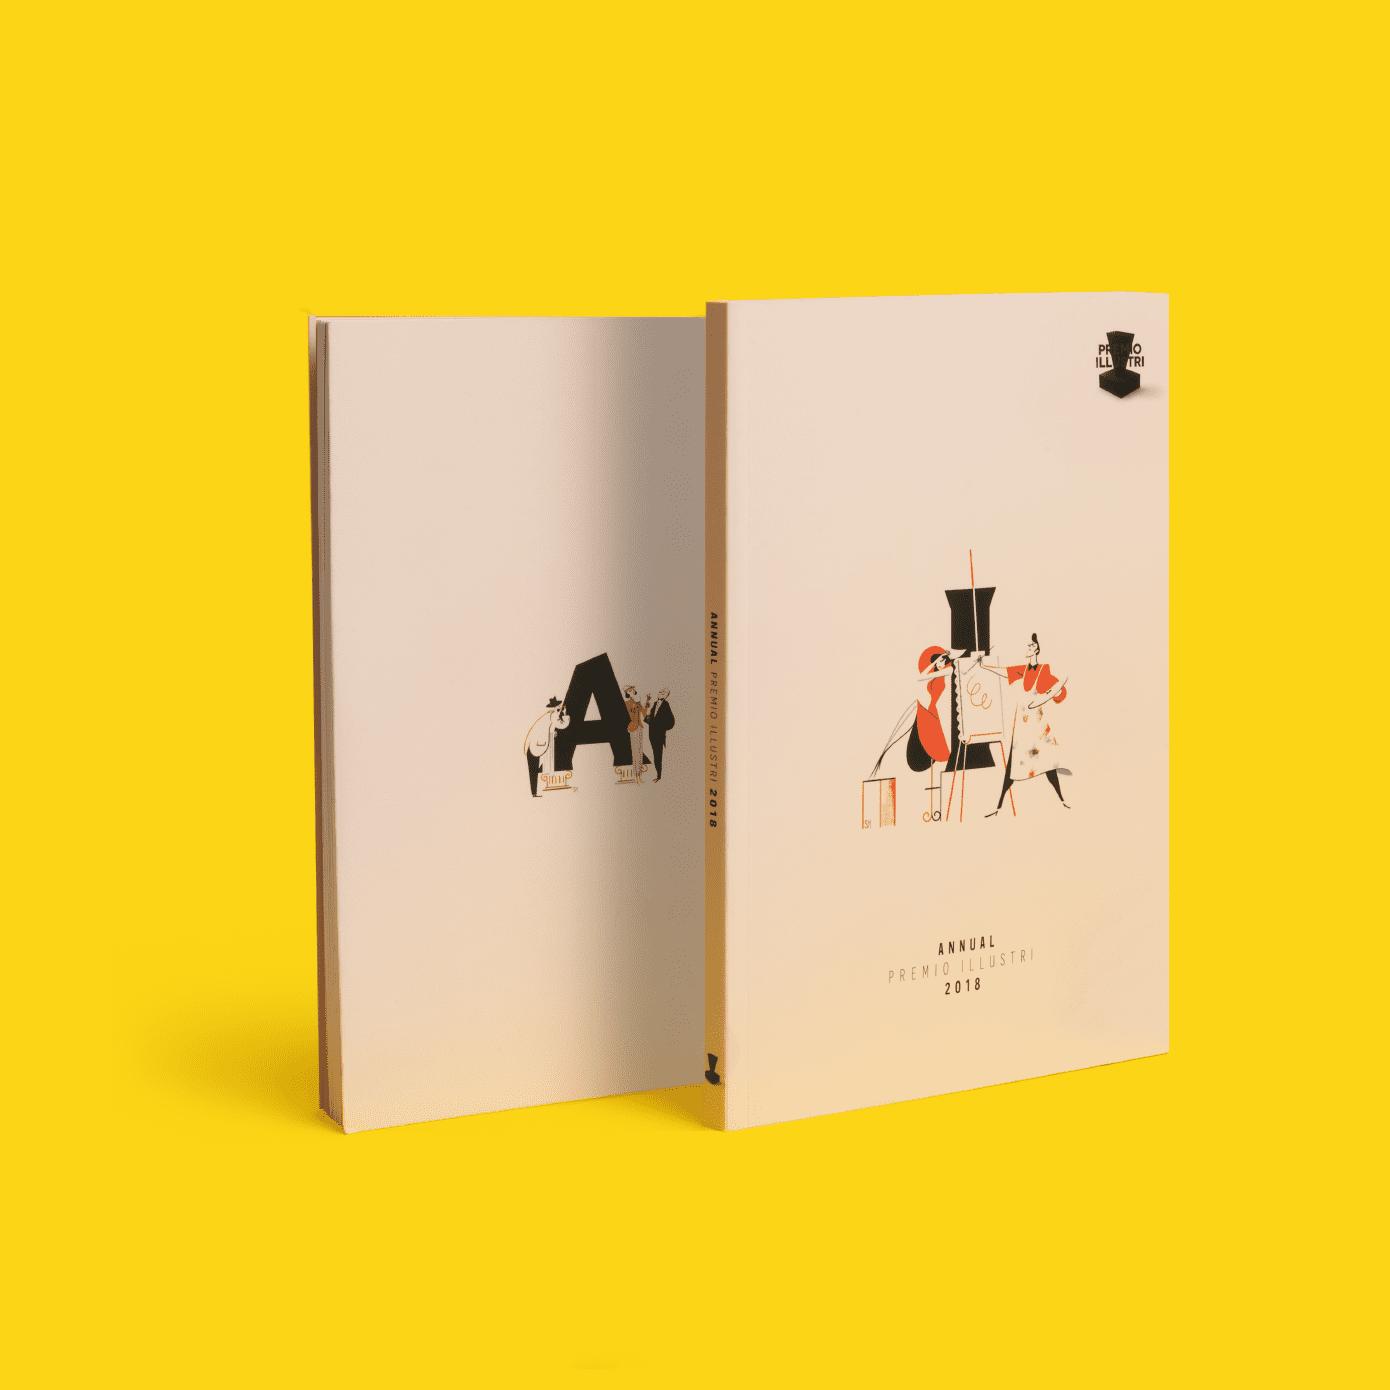 annual illustri 2018 design editoriale